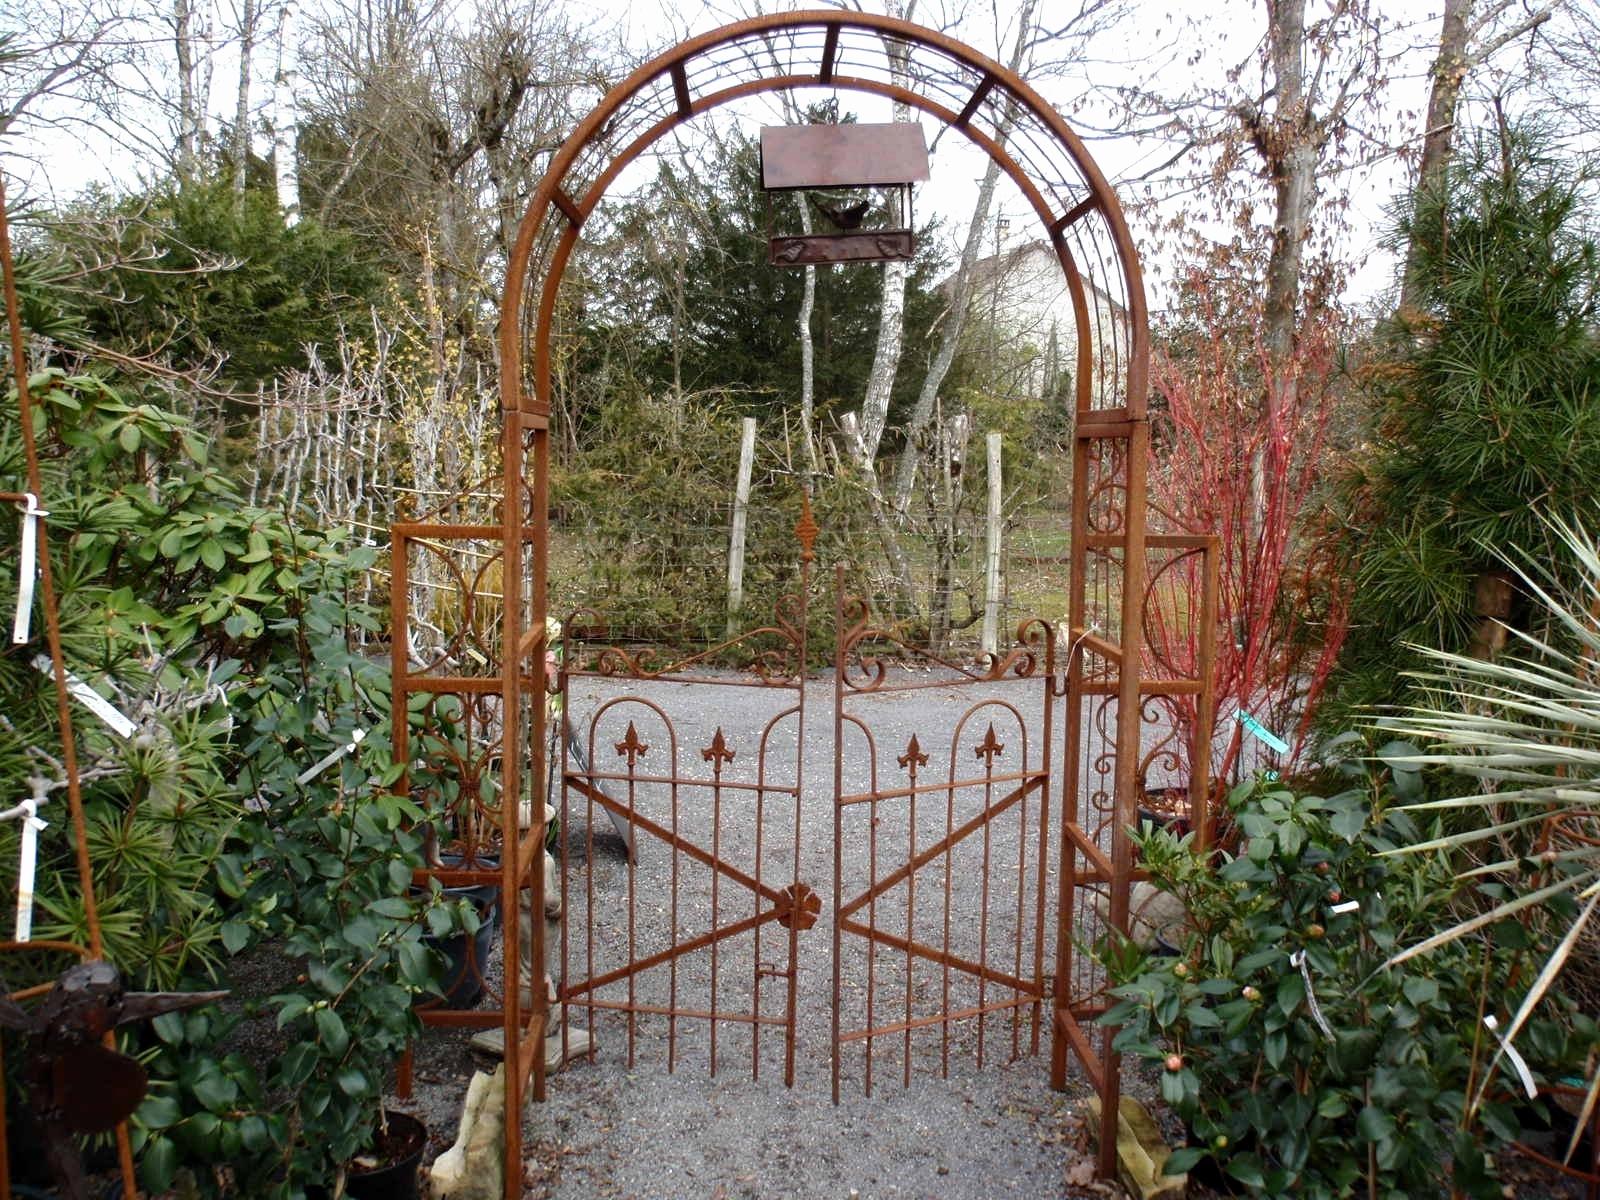 Castorama Bordure Jardin Luxe Photographie Portillon Pas Cher élégant Portillon Jardin Castorama Inspirant